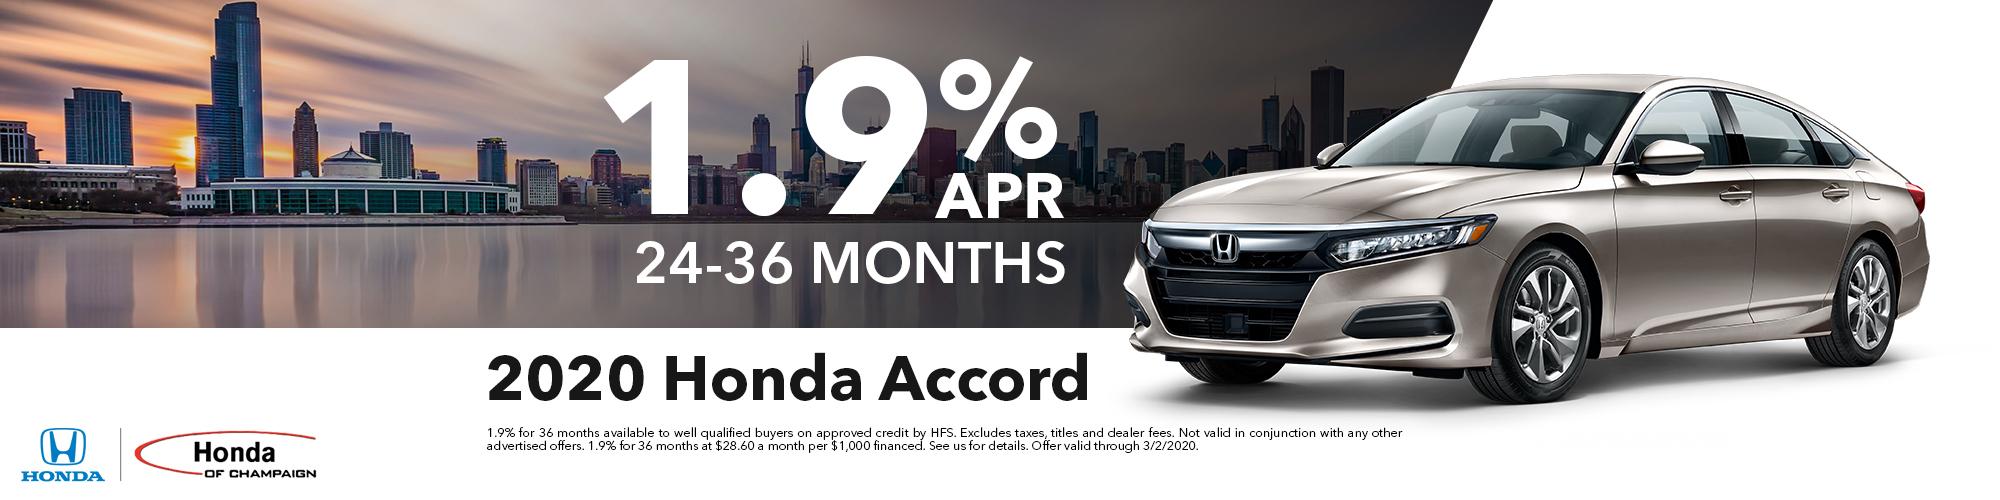 Honda Accord Special